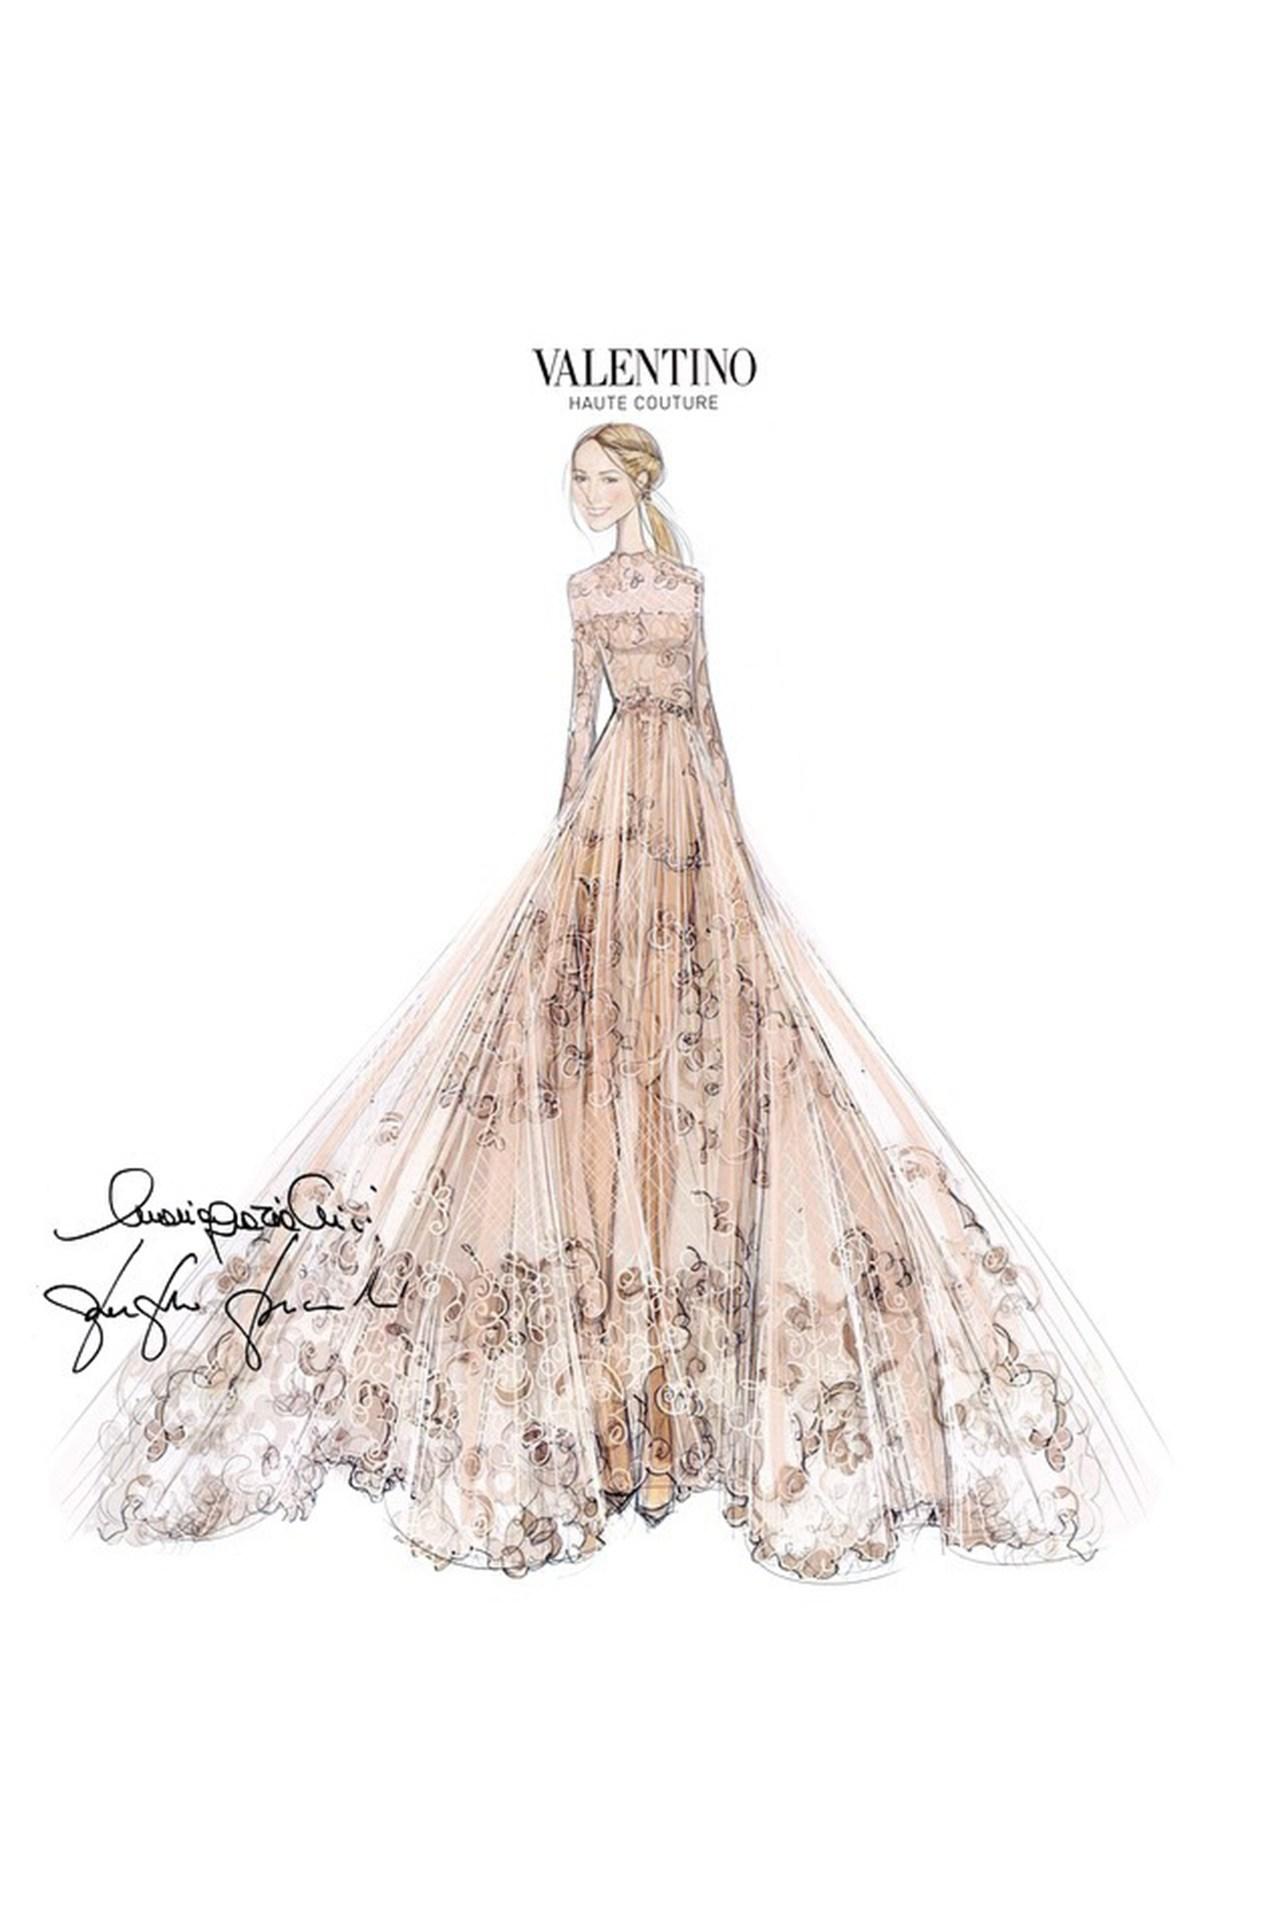 Drawn wedding dress godmother #11